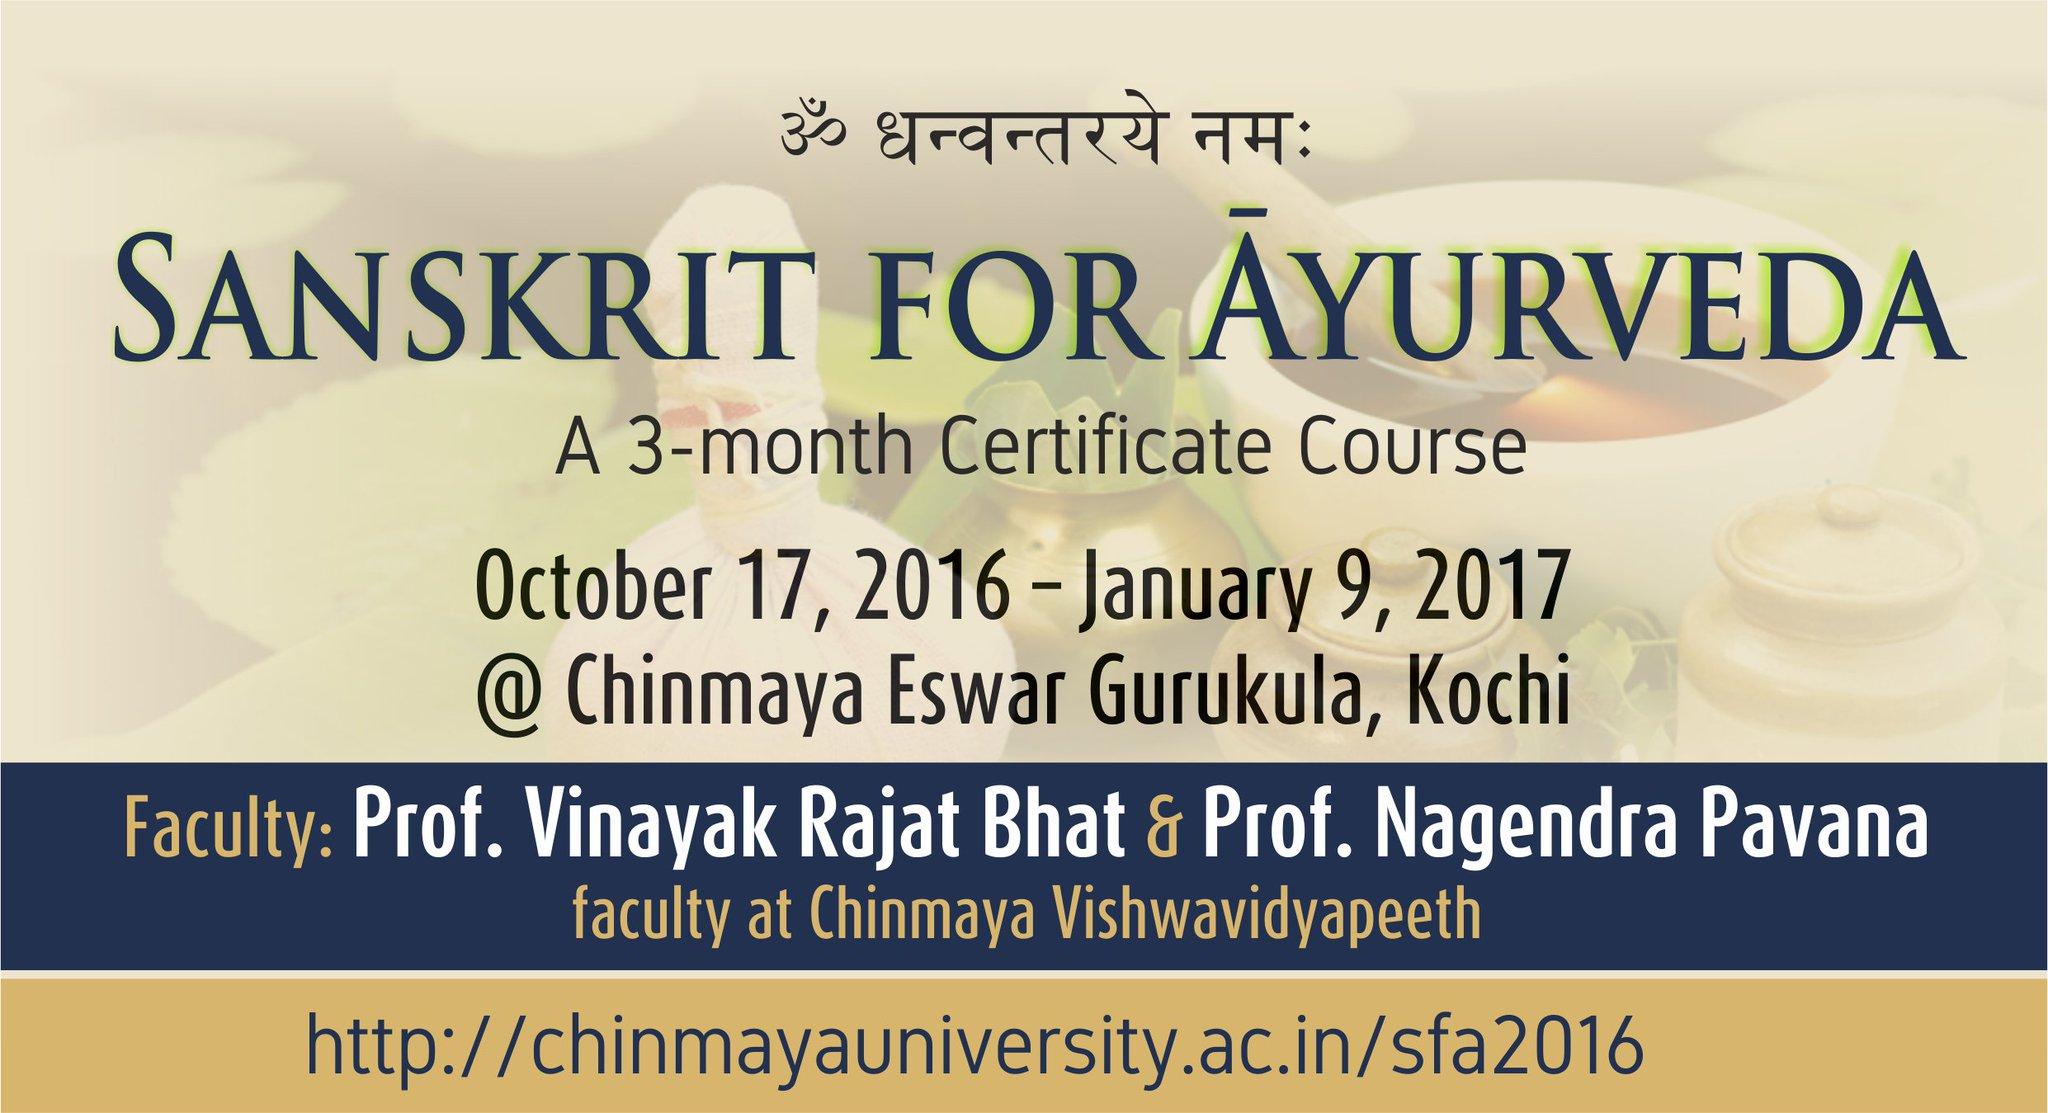 Chinmaya university on twitter sanskrit for ayurveda chinmaya university on twitter sanskrit for ayurveda certificate course at our chinmaya eswar gurukula campus kochi xflitez Choice Image